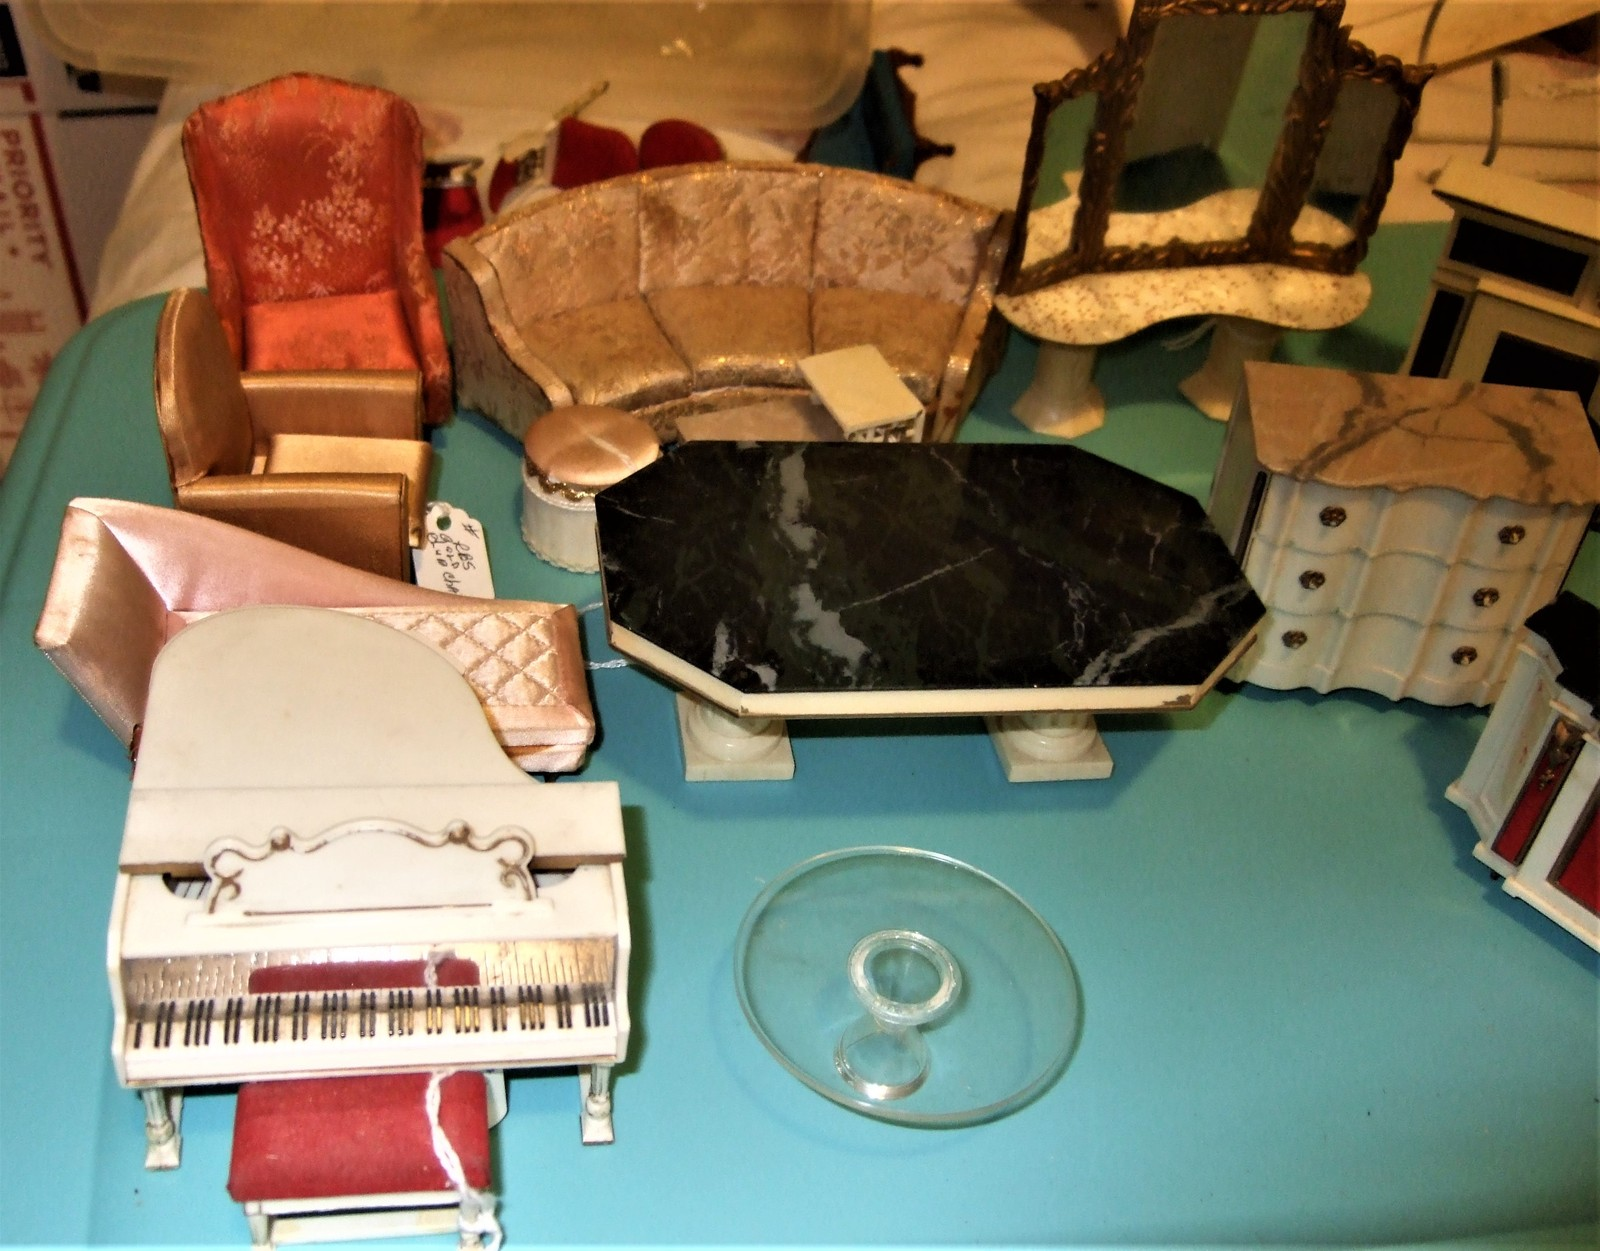 Idea Tots - Large lot of 15 vintage Ideal Petite Princess Dollhouse furniture